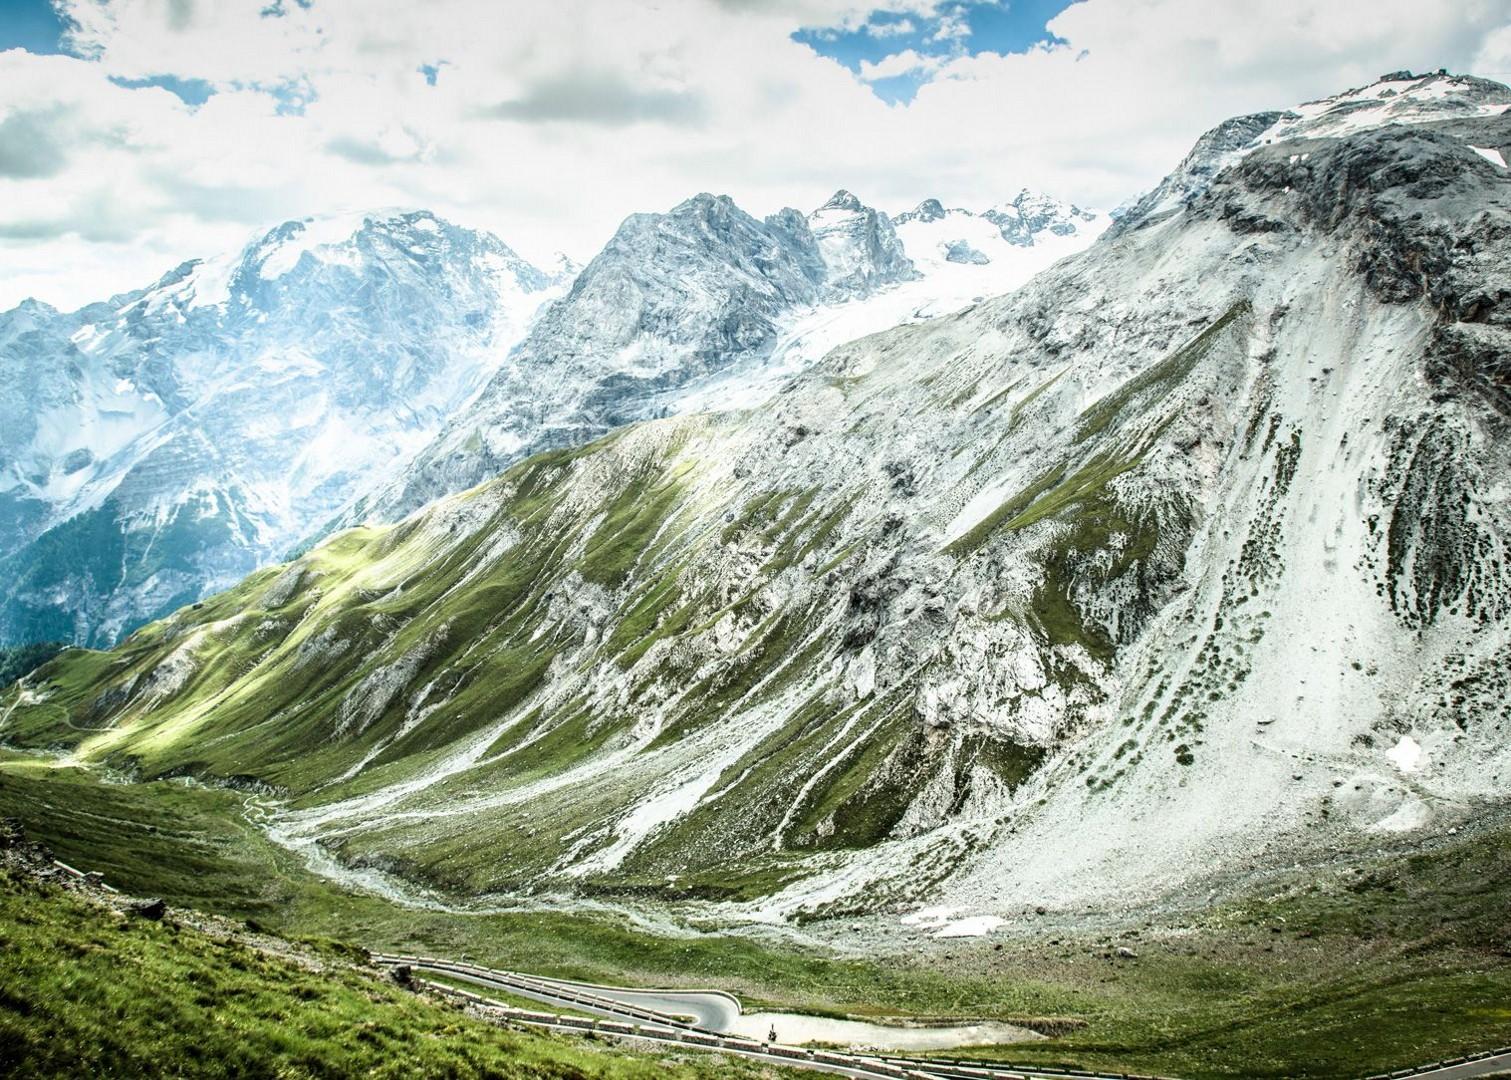 mountain-scenary-france-switzerland-italy-skedaddle-holiday.jpg - Italy - Raid Dolomiti - Guided Road Cycling Holiday - Italia Road Cycling